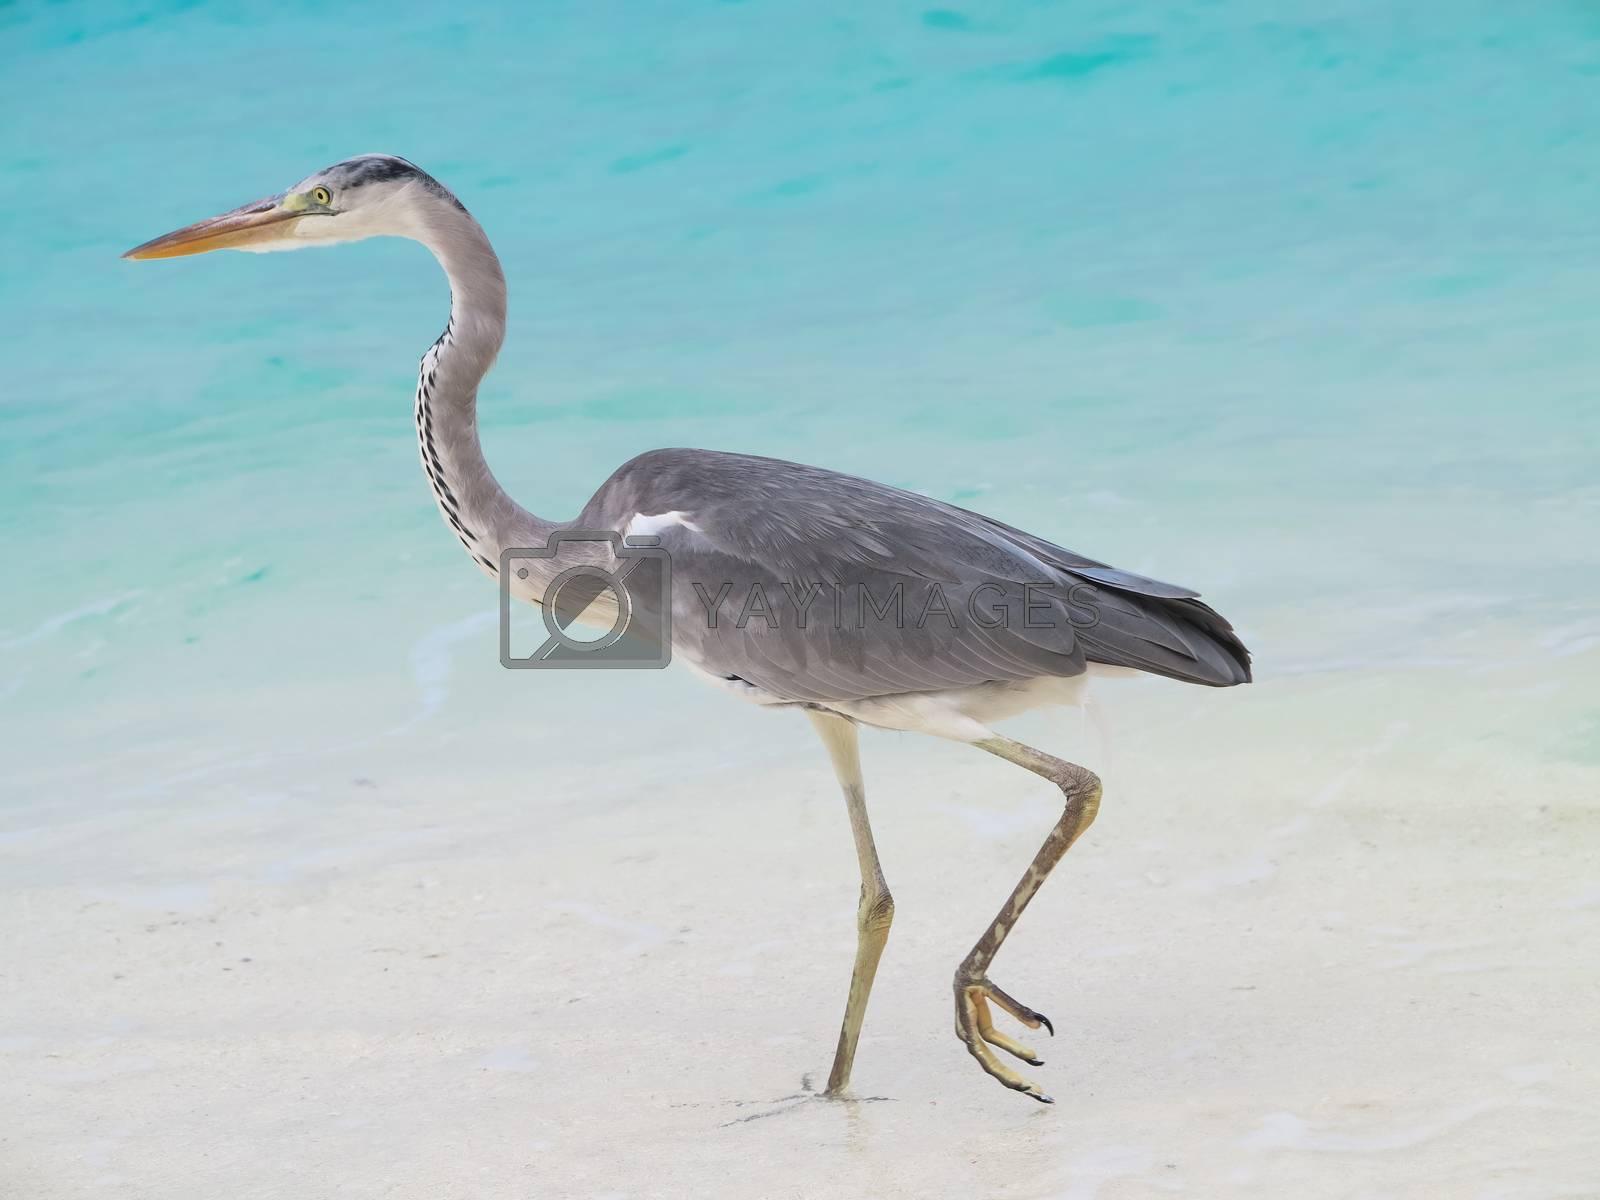 Sea heron on the beach by get4net